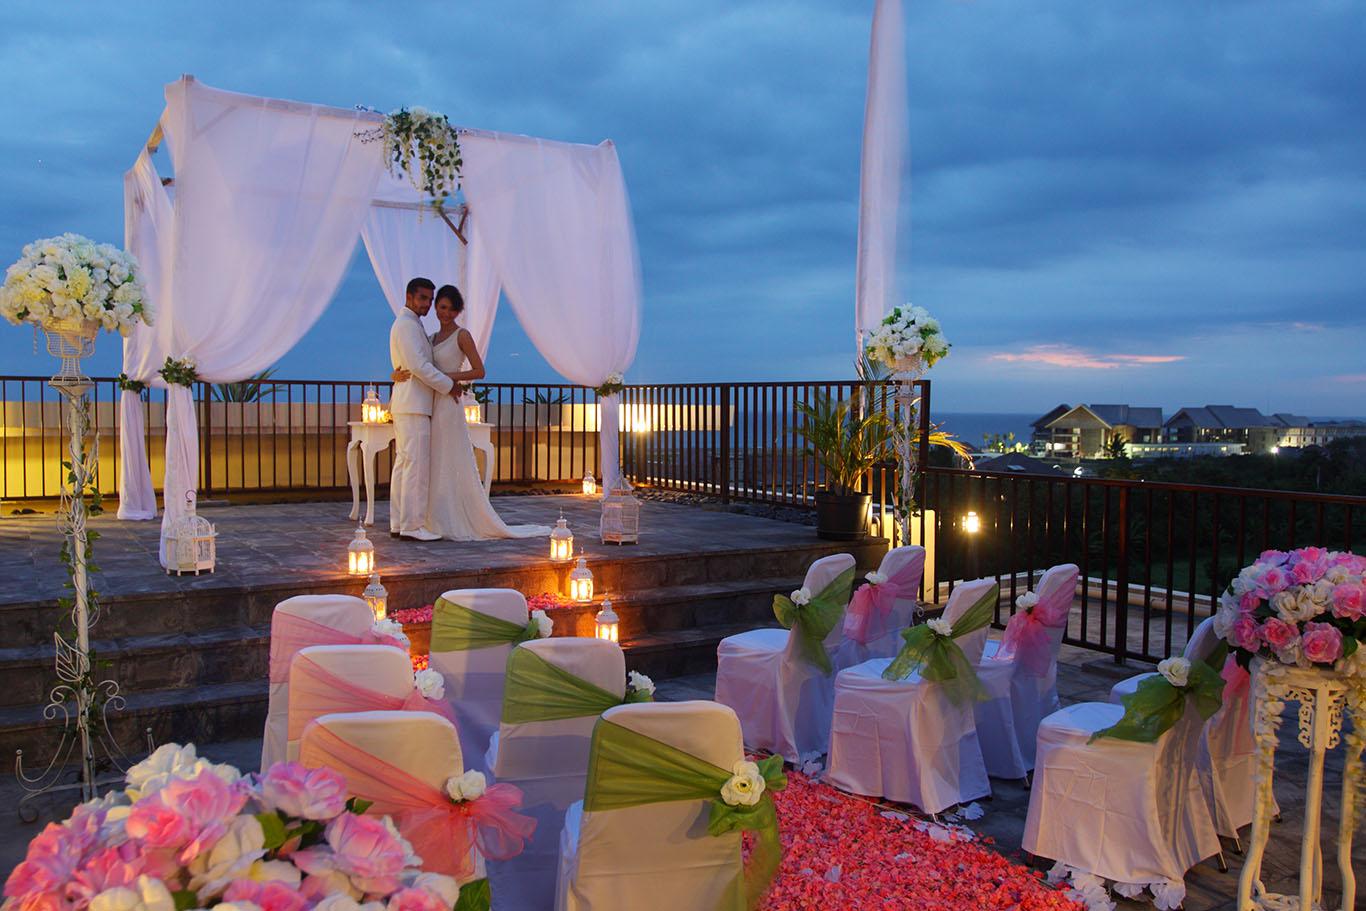 Elaborate Wedding & Reception